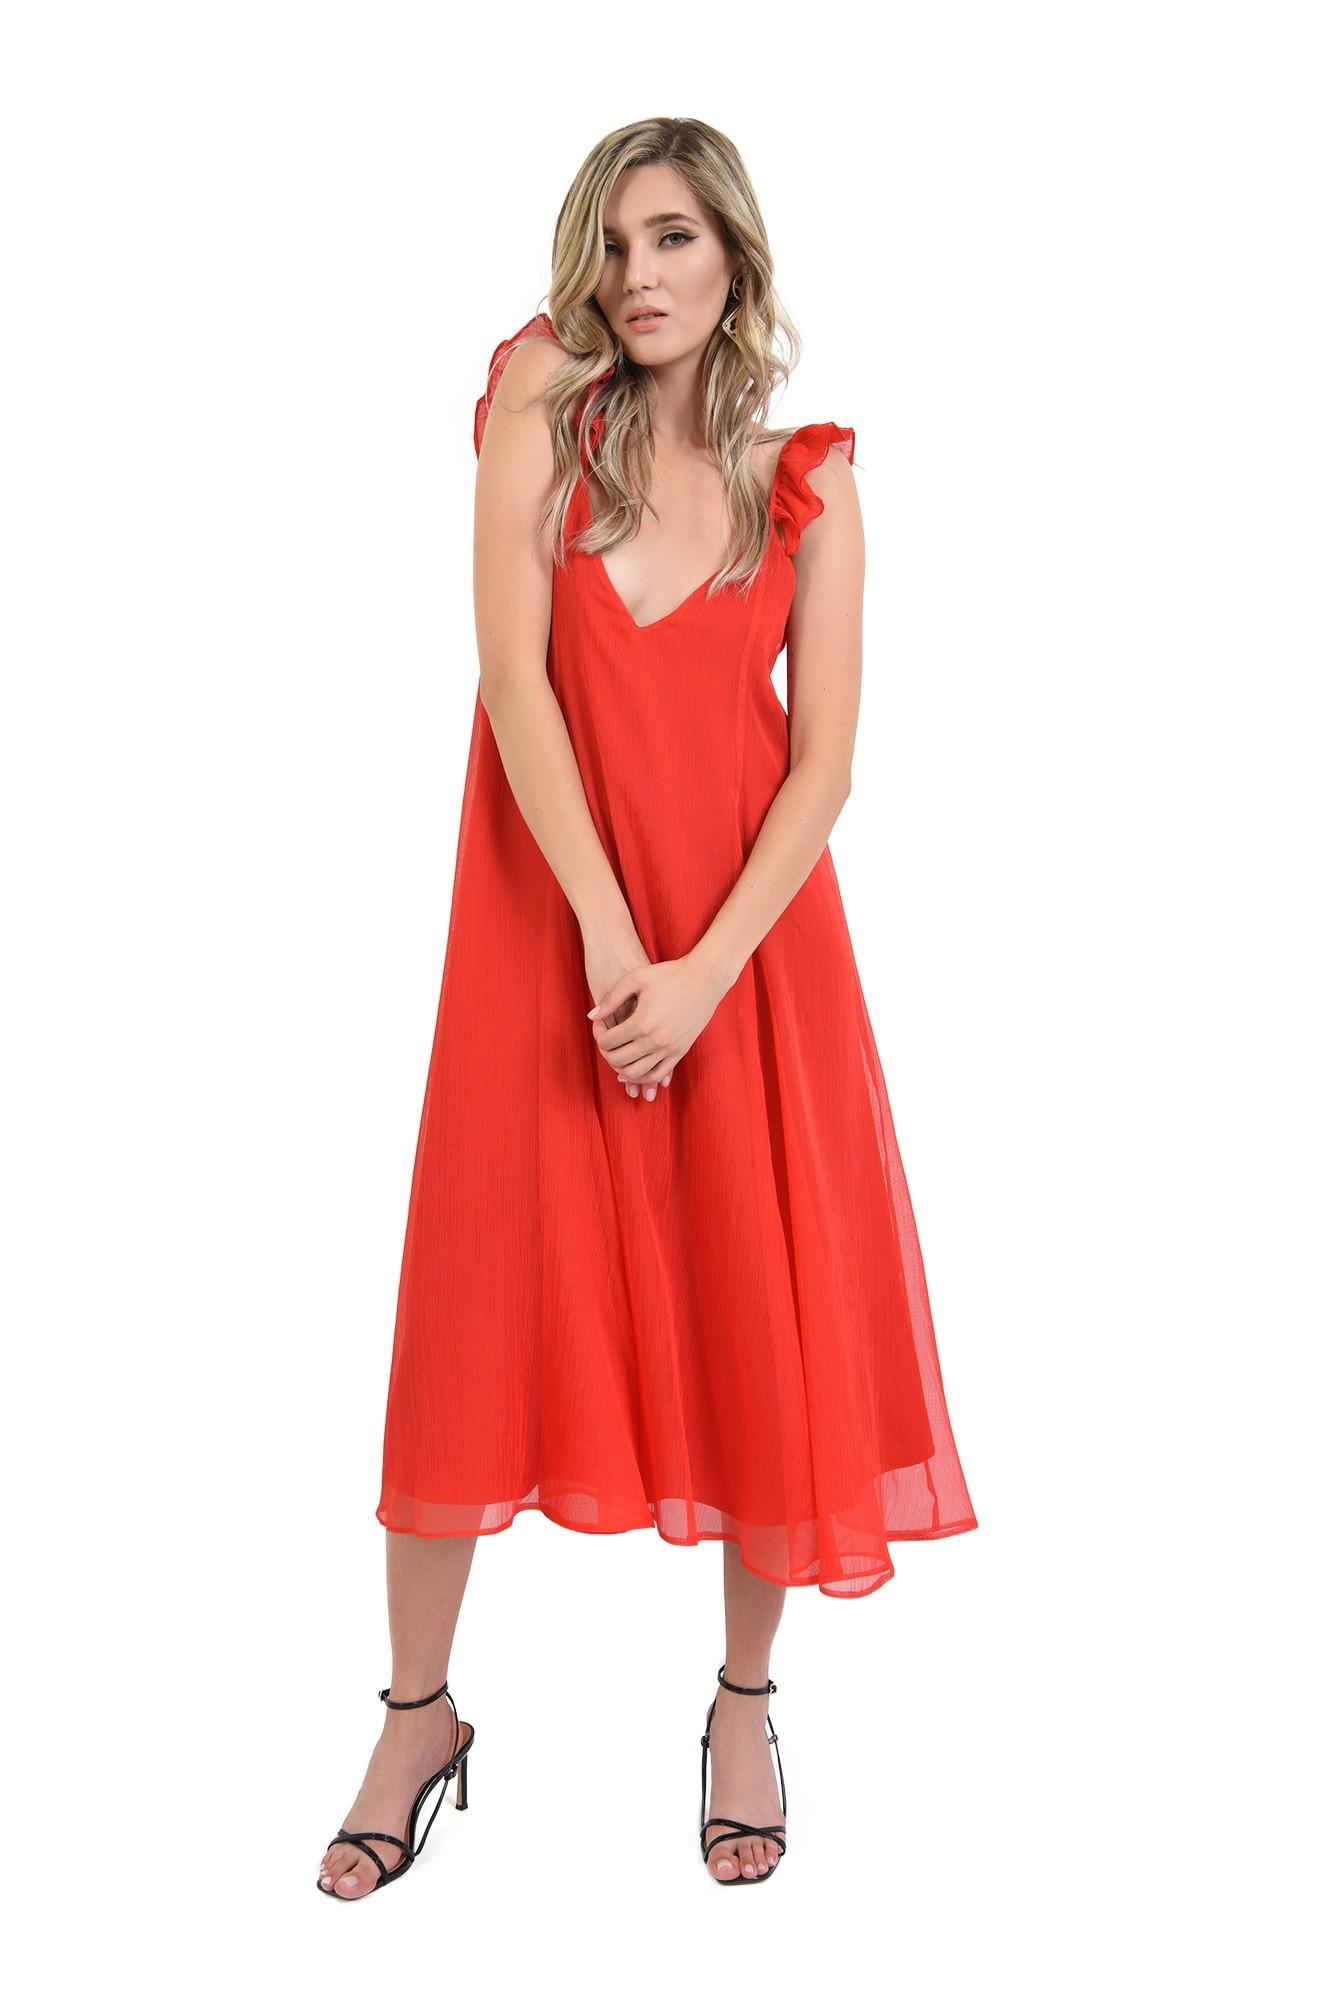 360 - rochie rosie,midi, tip furou, Poema